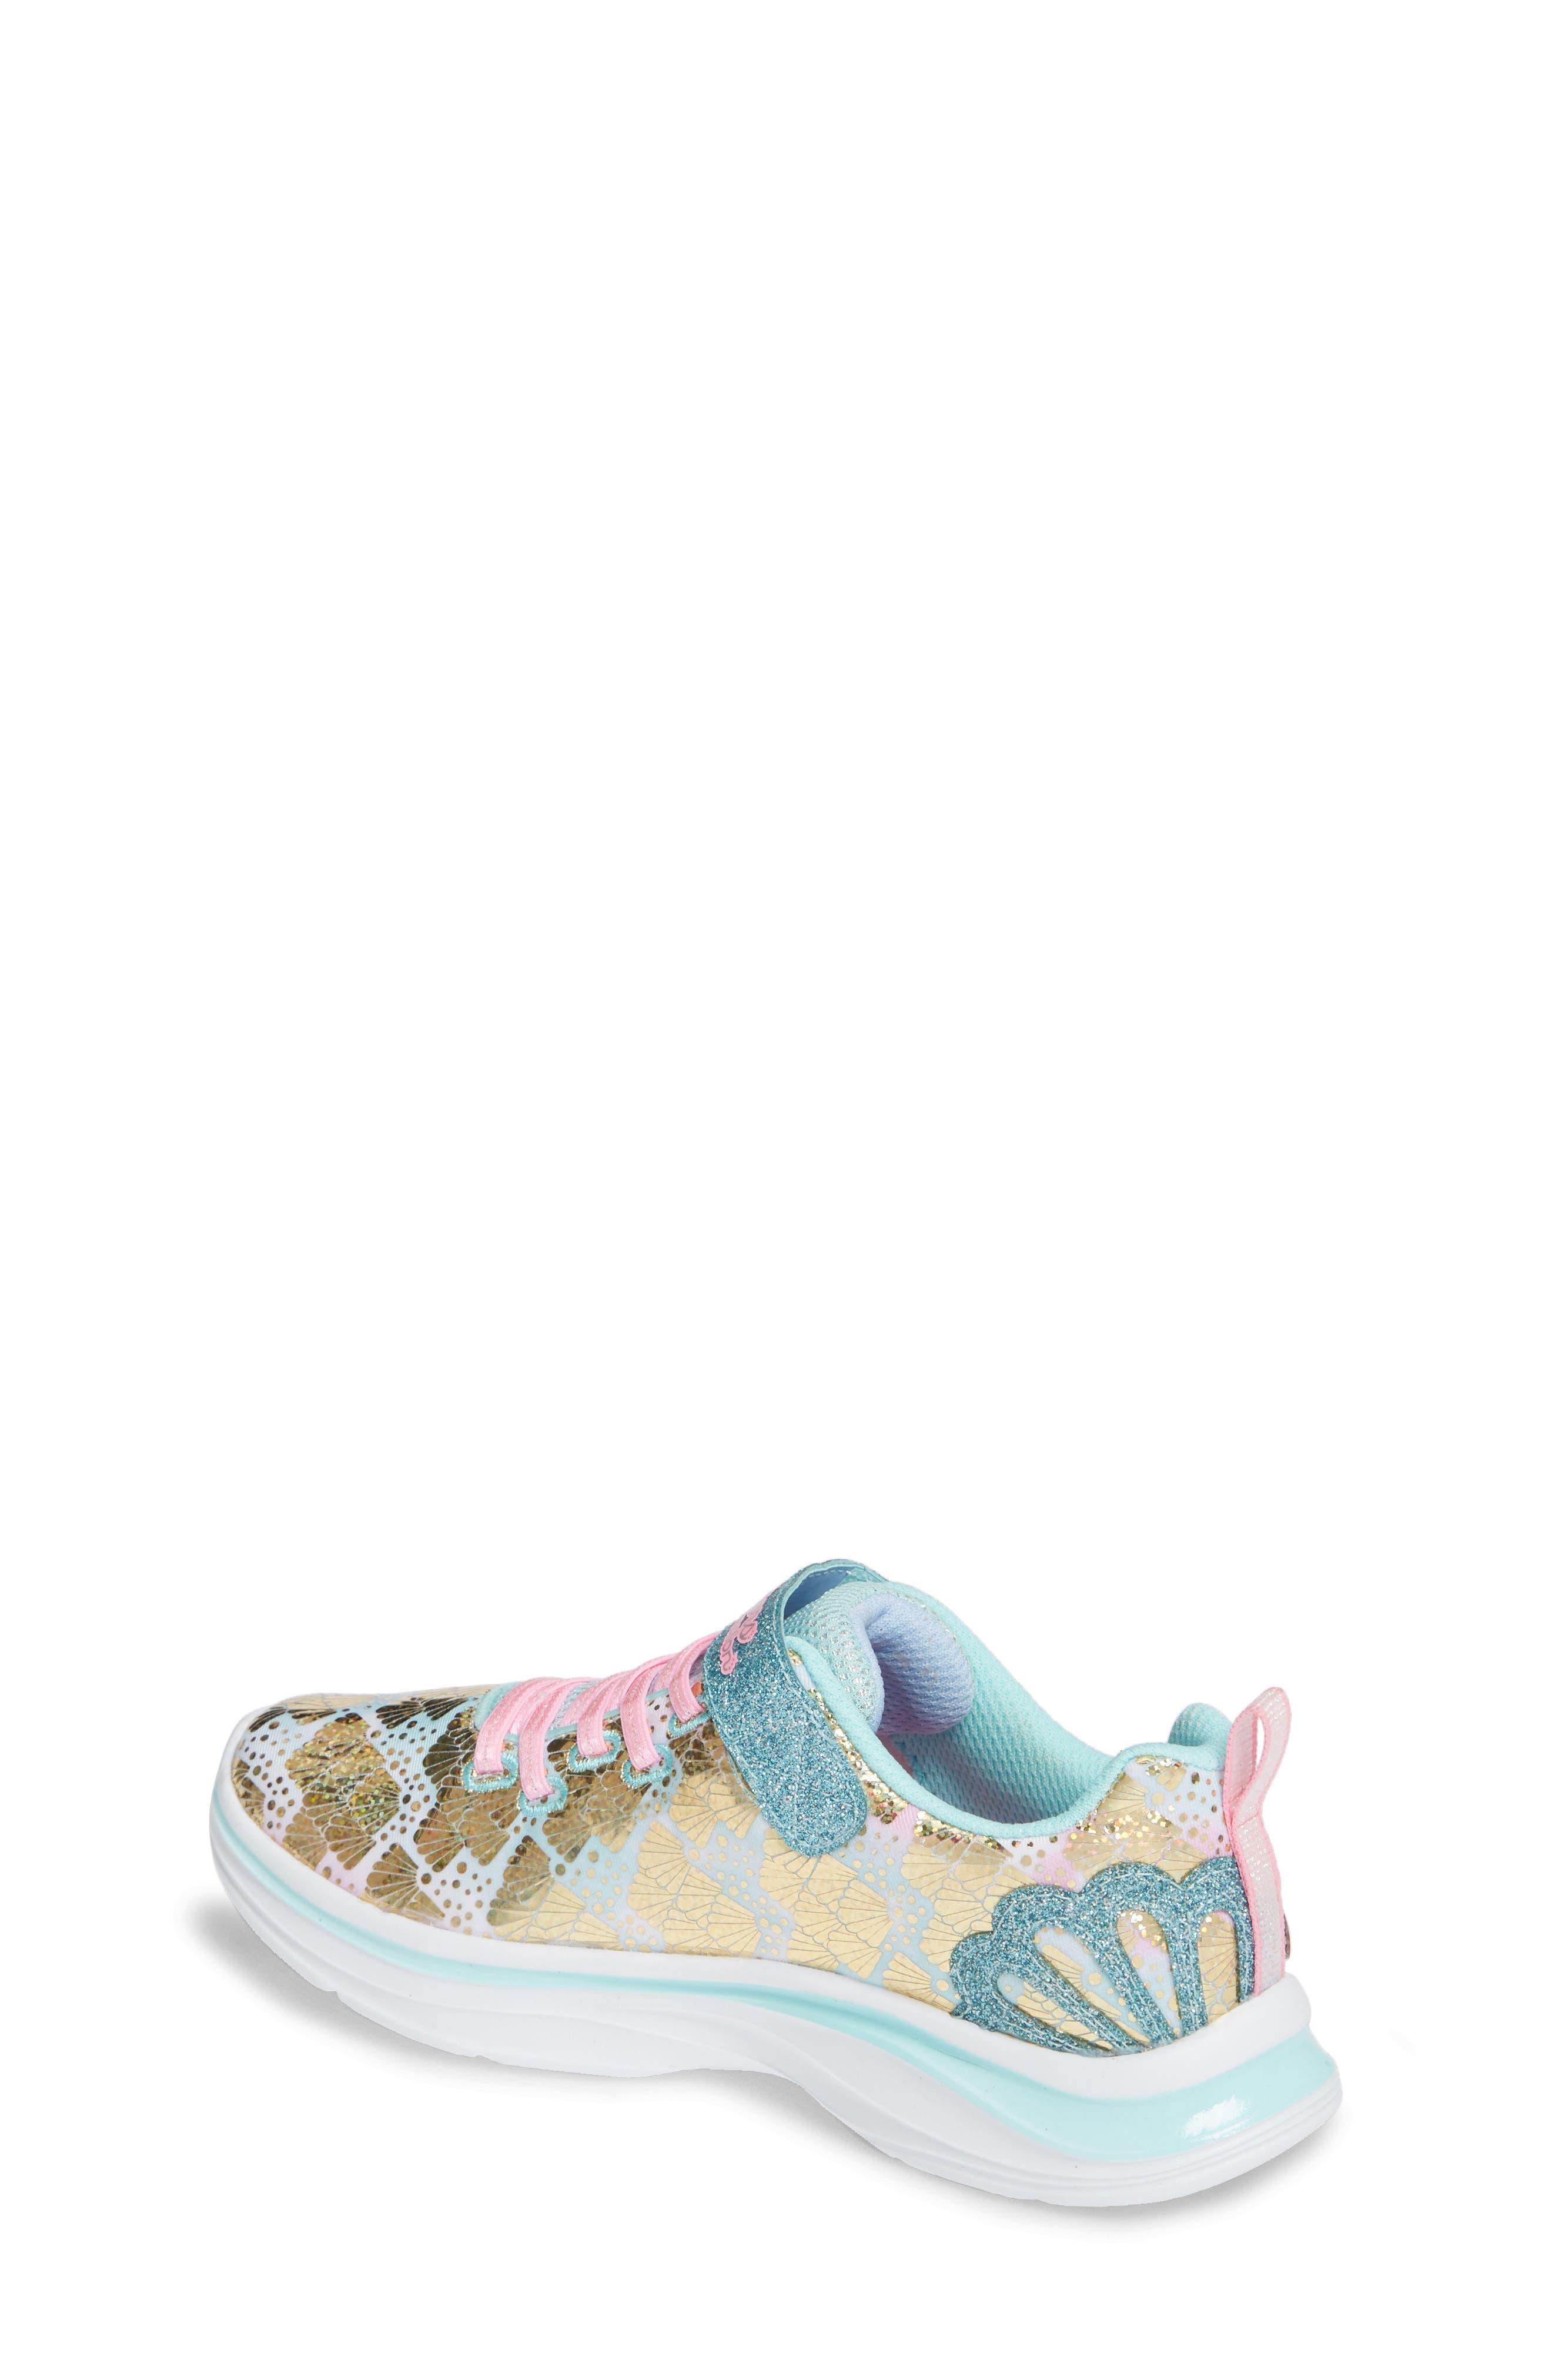 SKECHERS, Double Dreams Shimmer Sneaker, Alternate thumbnail 2, color, AQUA/ PINK TEXTILE